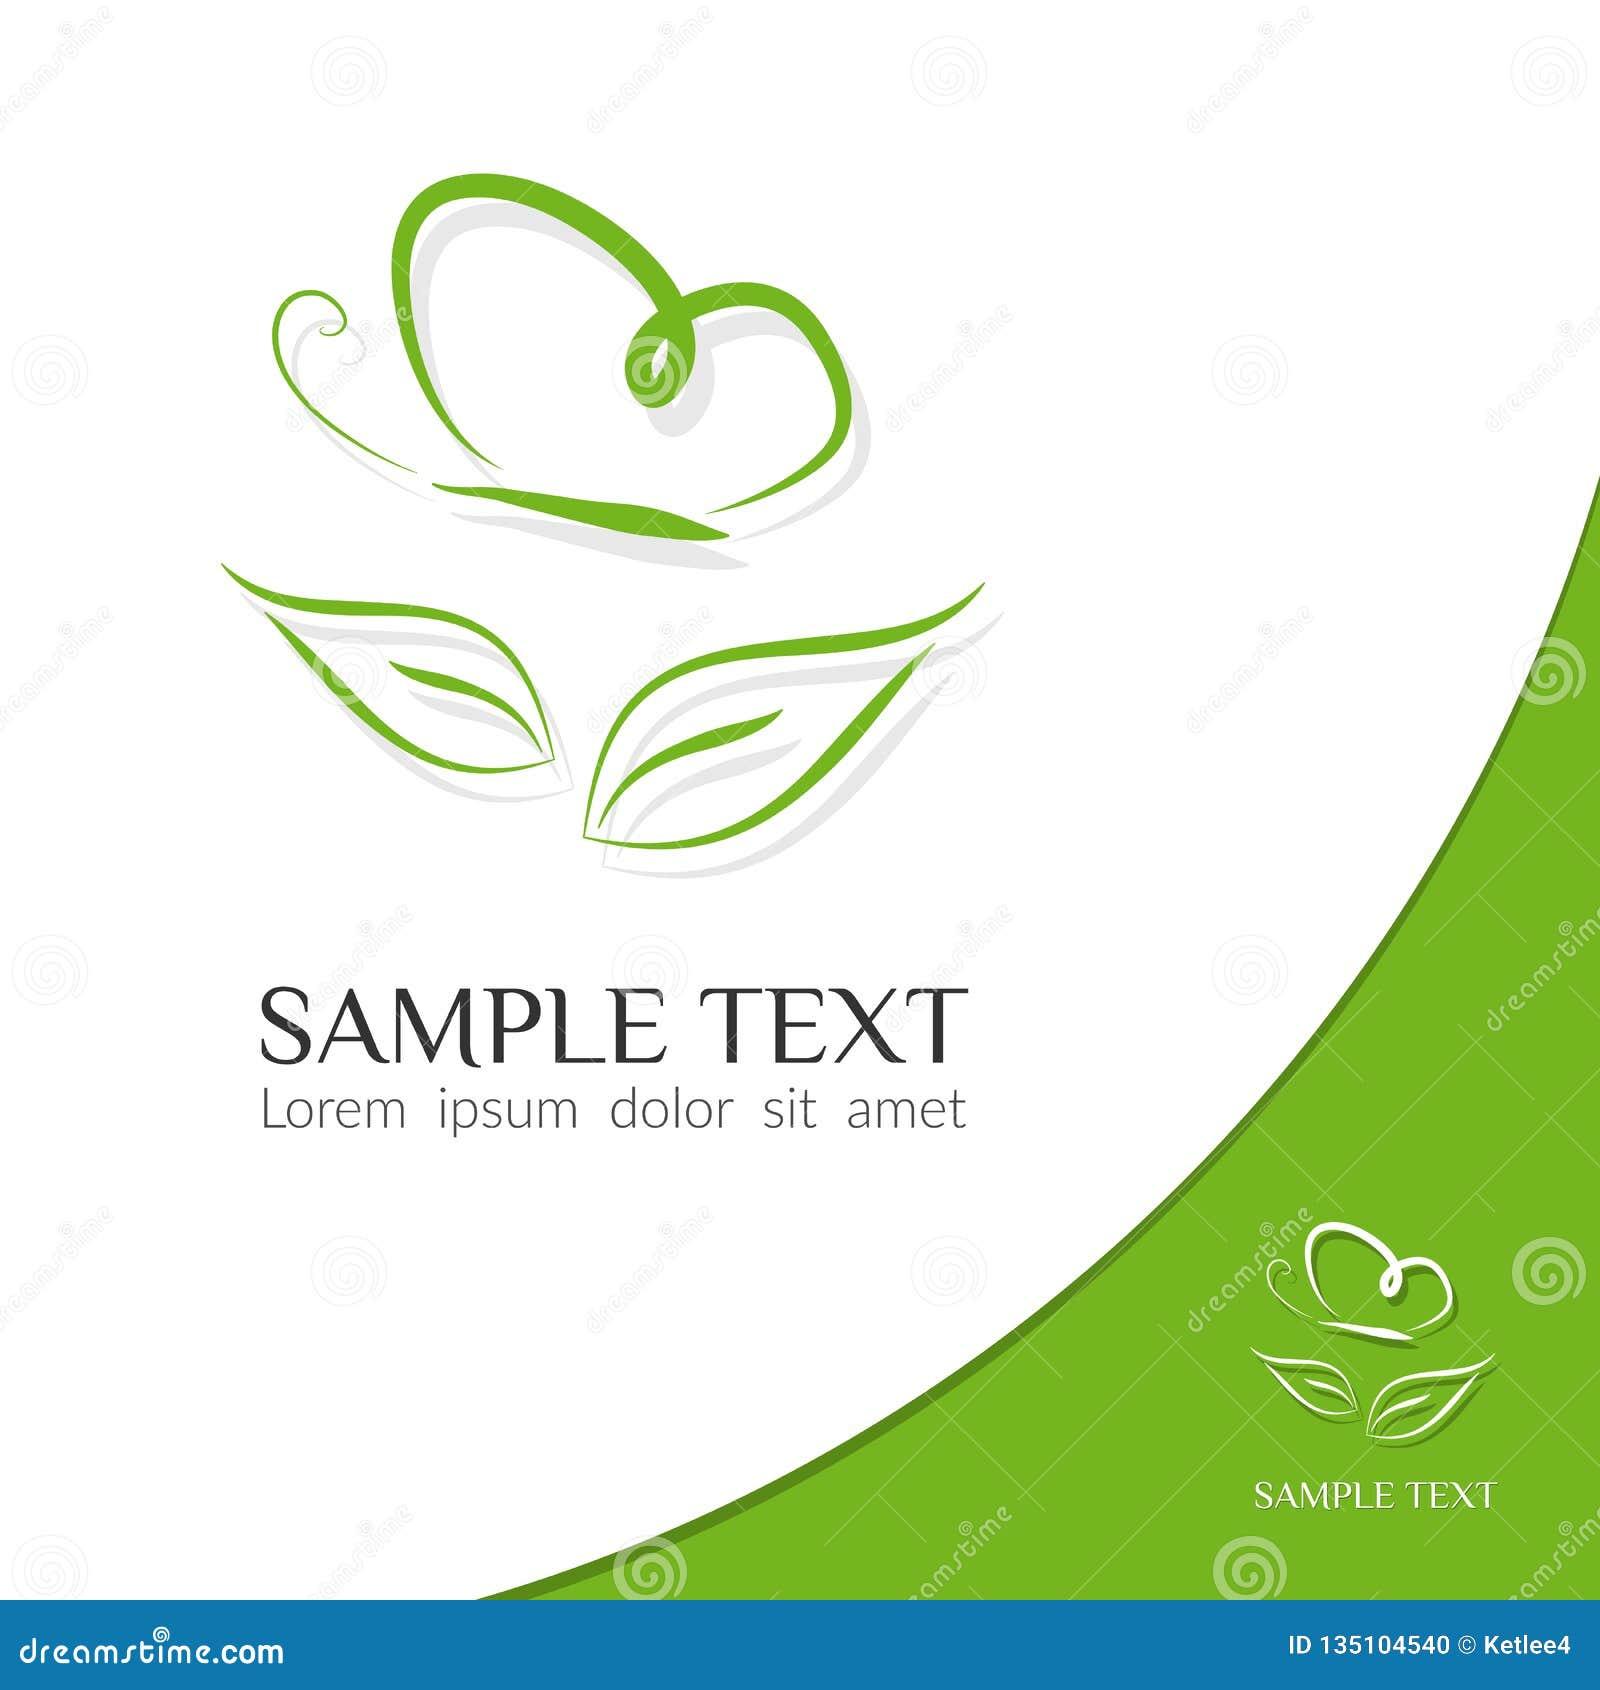 Eco象绿色蝴蝶一只蝴蝶的剪影的标志线在一片叶子的在一个轻的背景现代图形设计商标